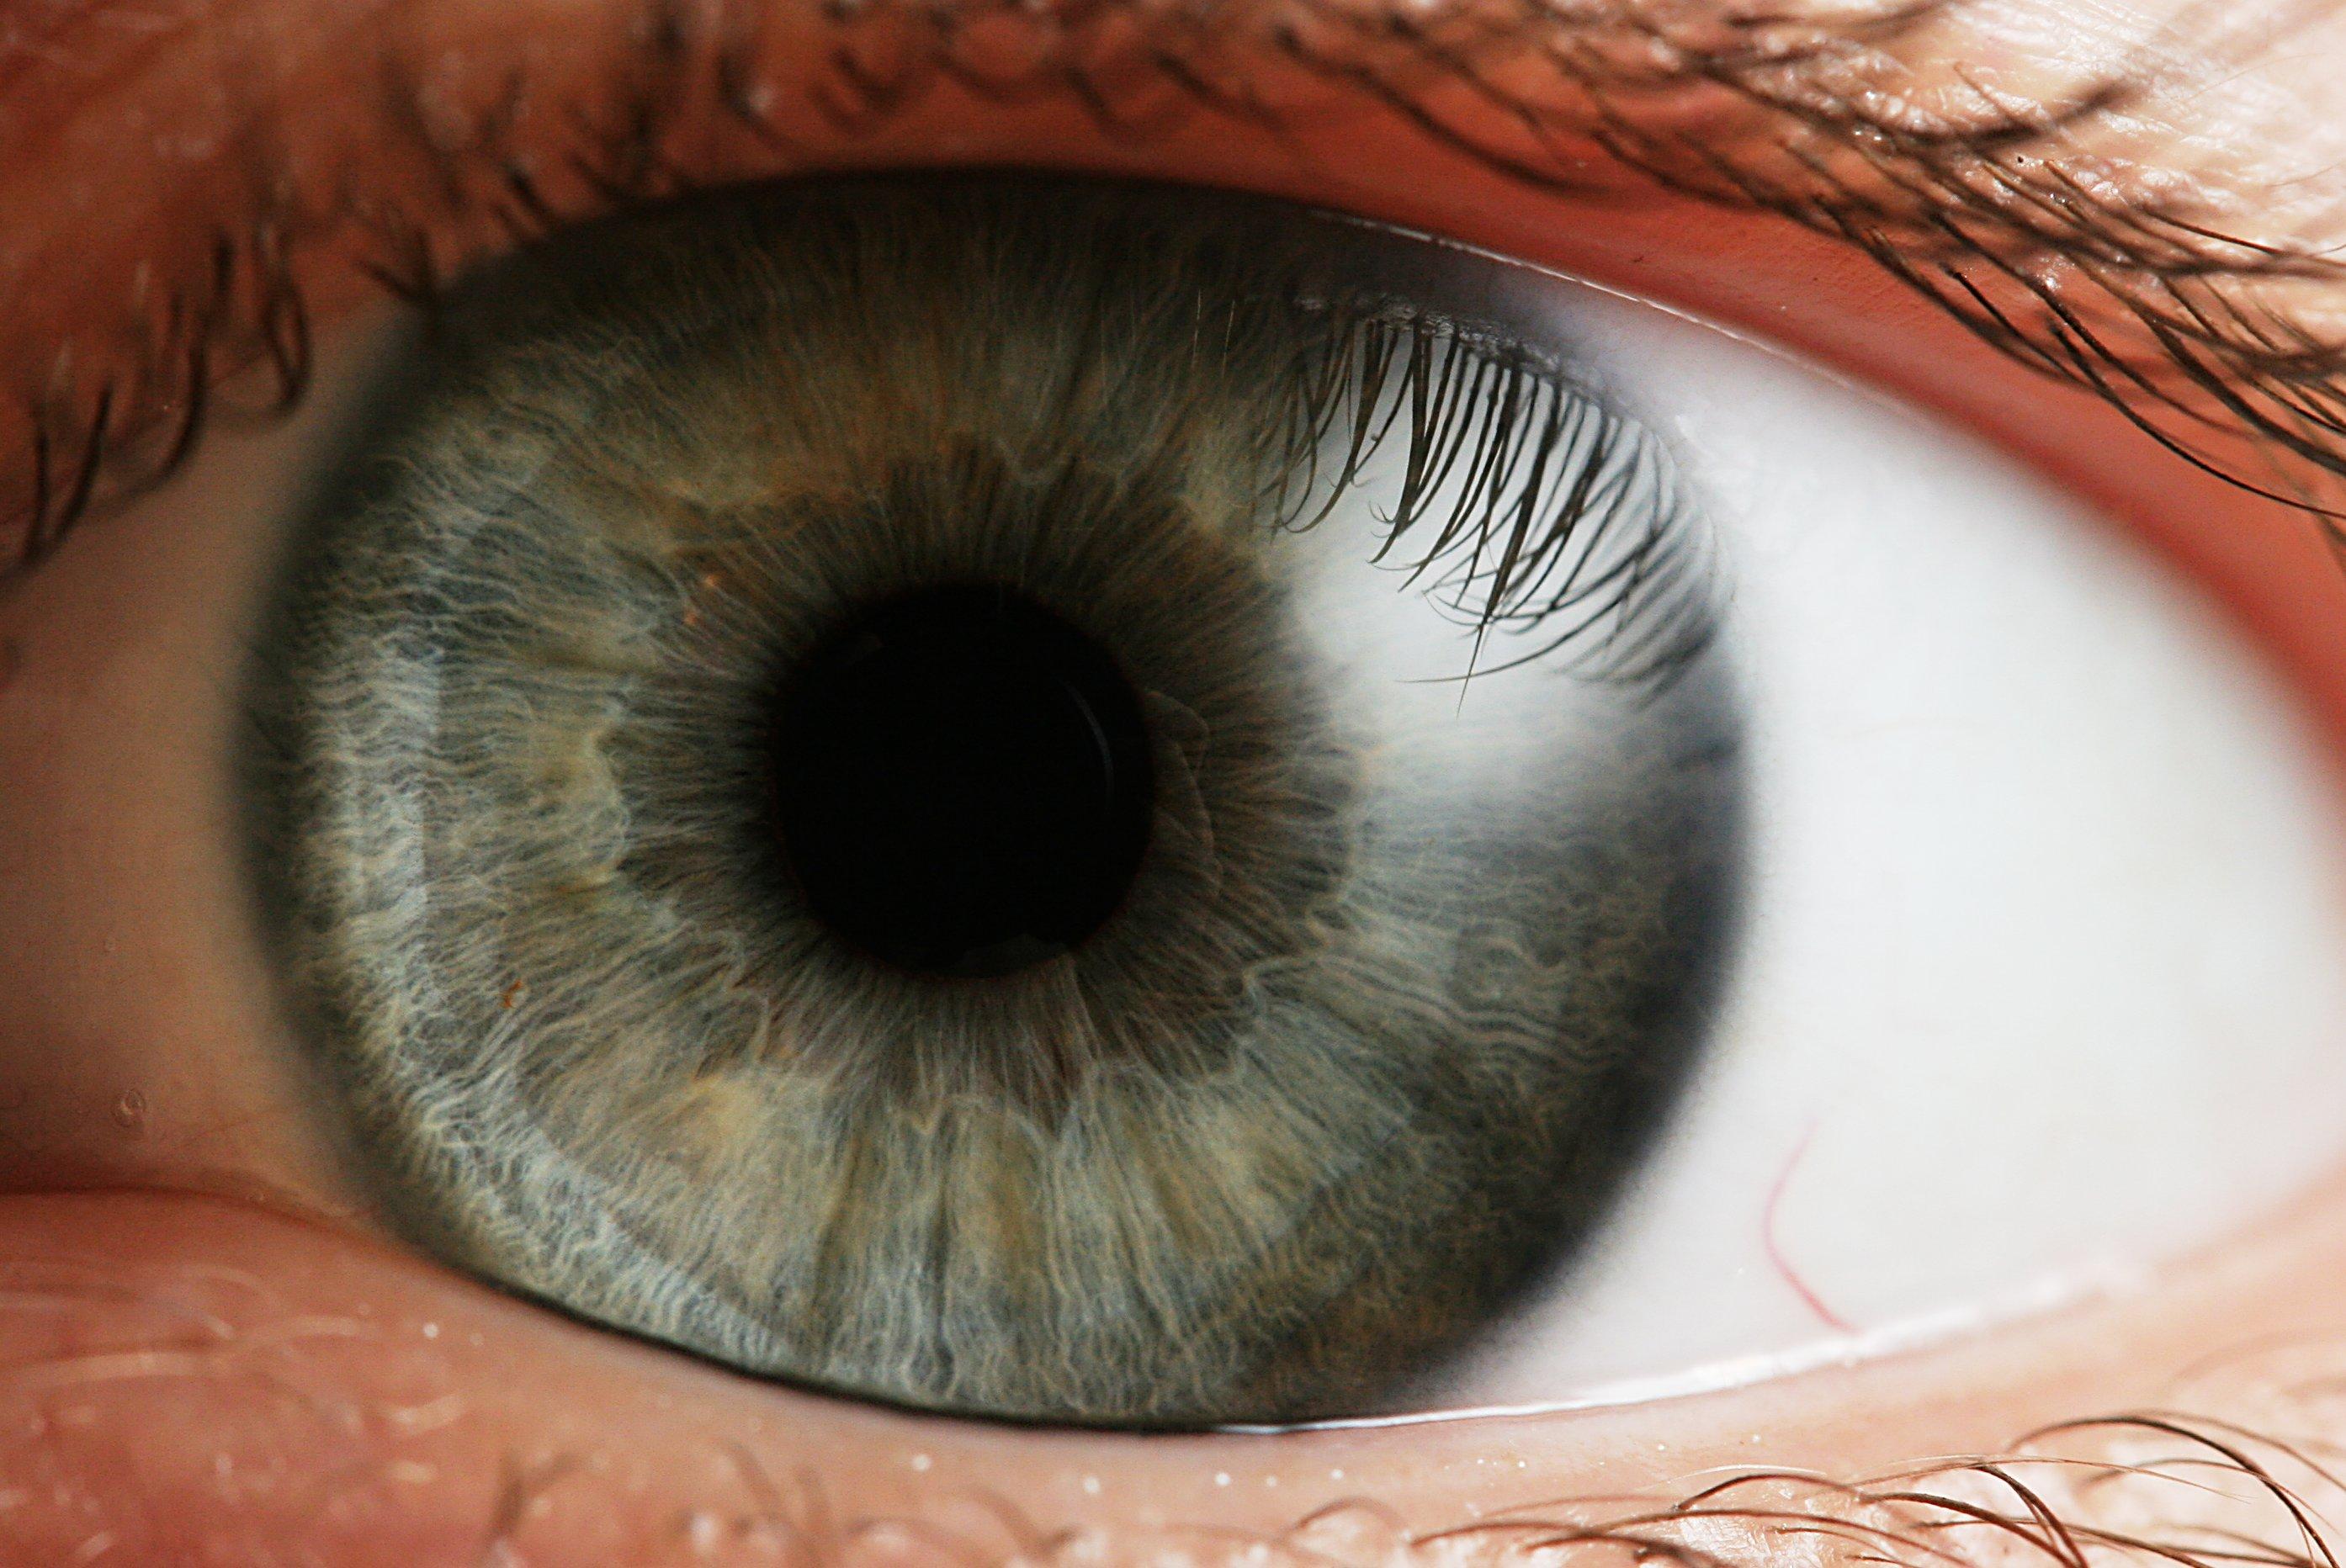 Оболочка глаза радужная